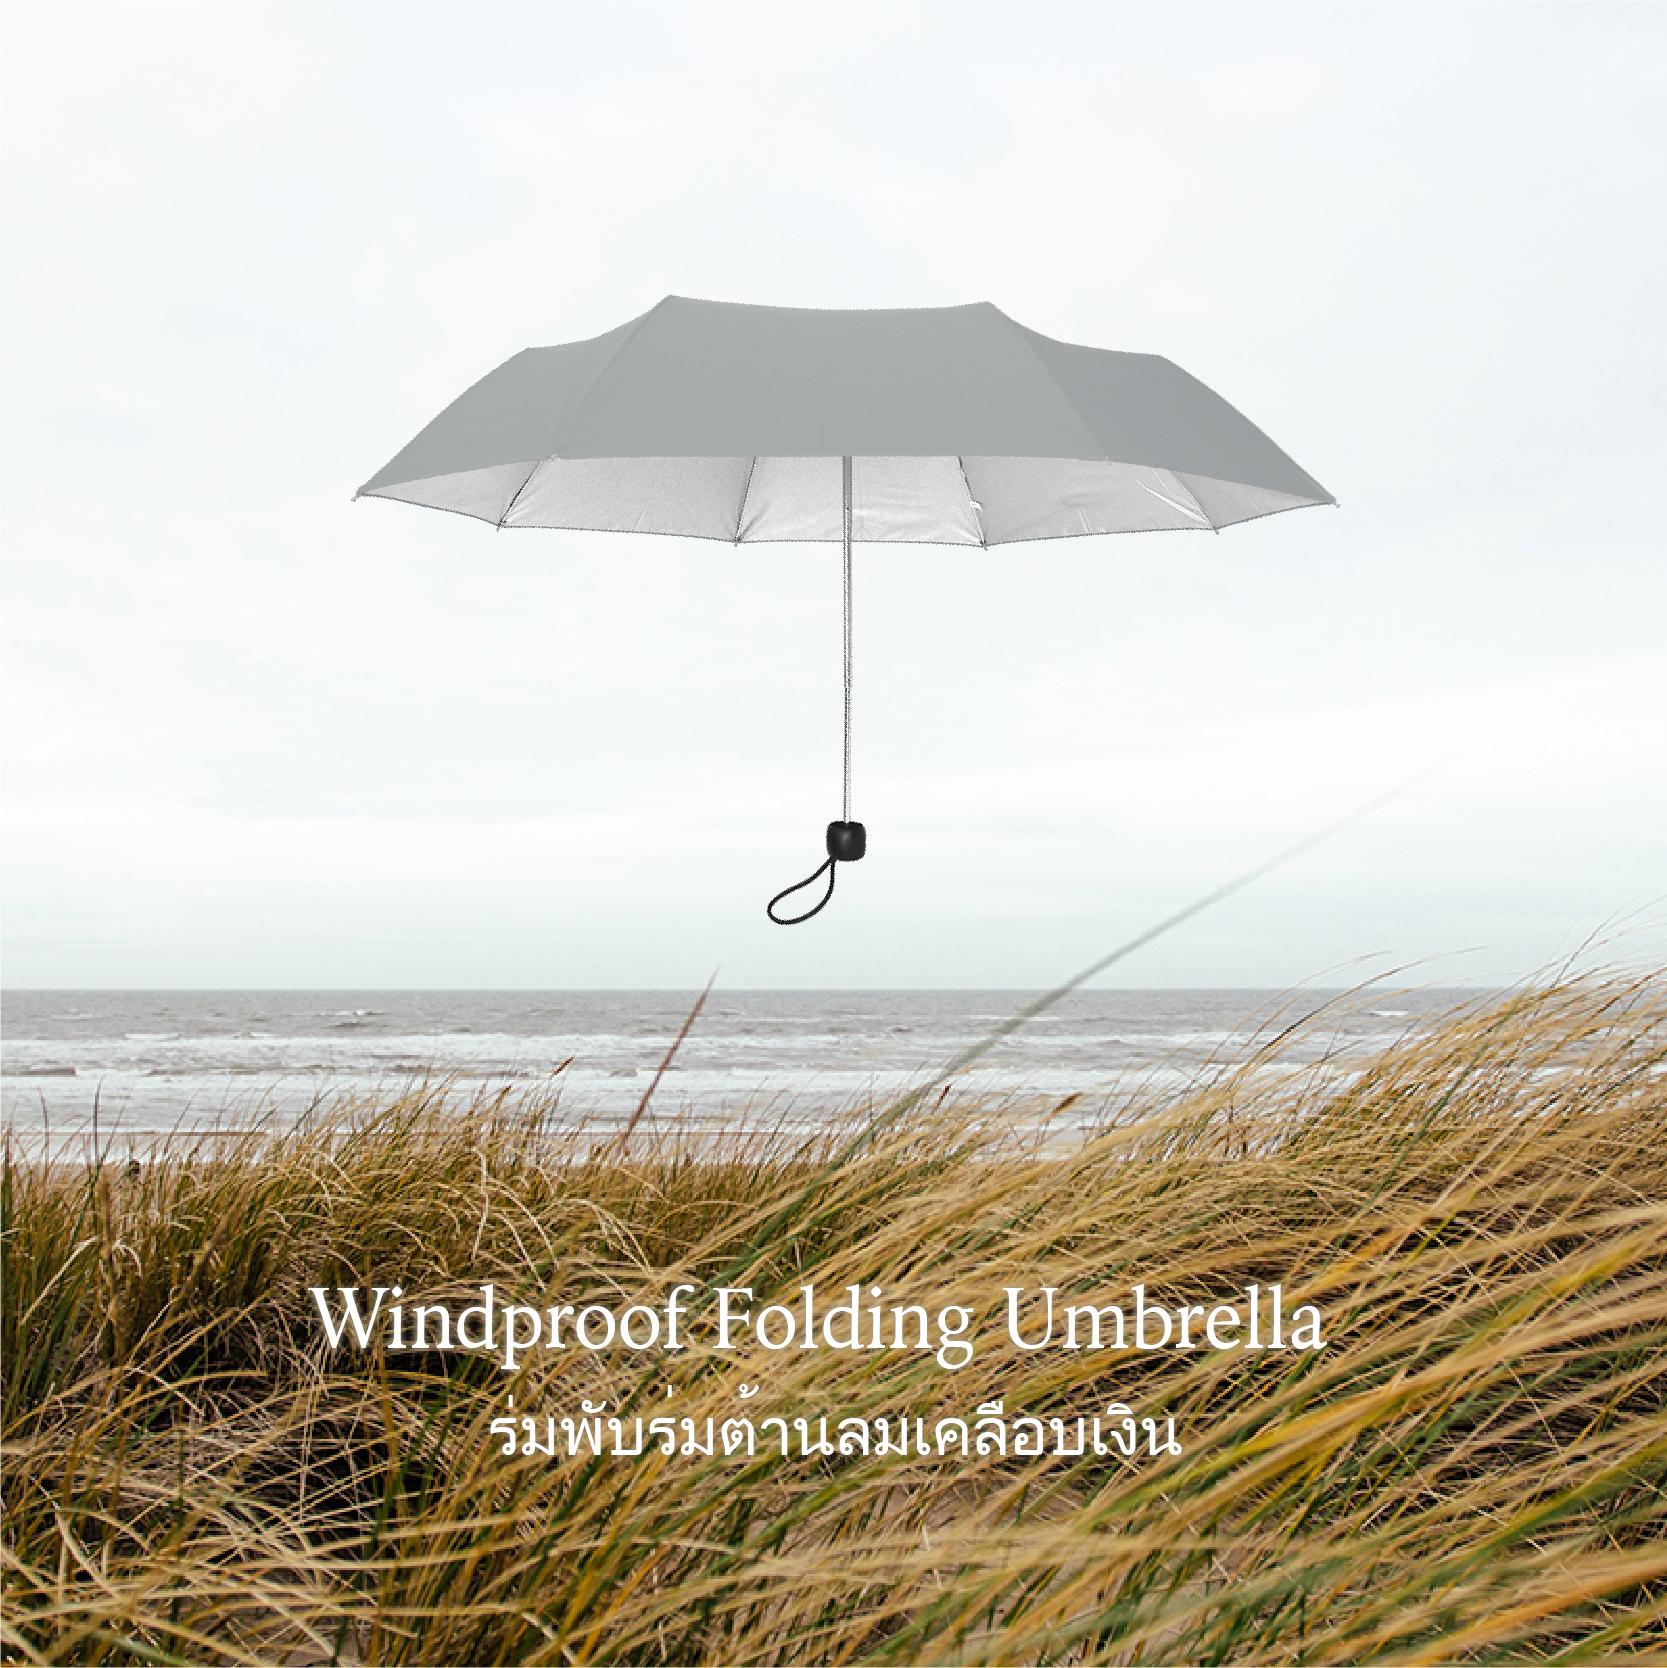 Windproof UV Folding Umbrella ร่มพับ ต้านลม 3ตอน เคลือบเงิน กันแดด กันยูวี กันฝน-เทา